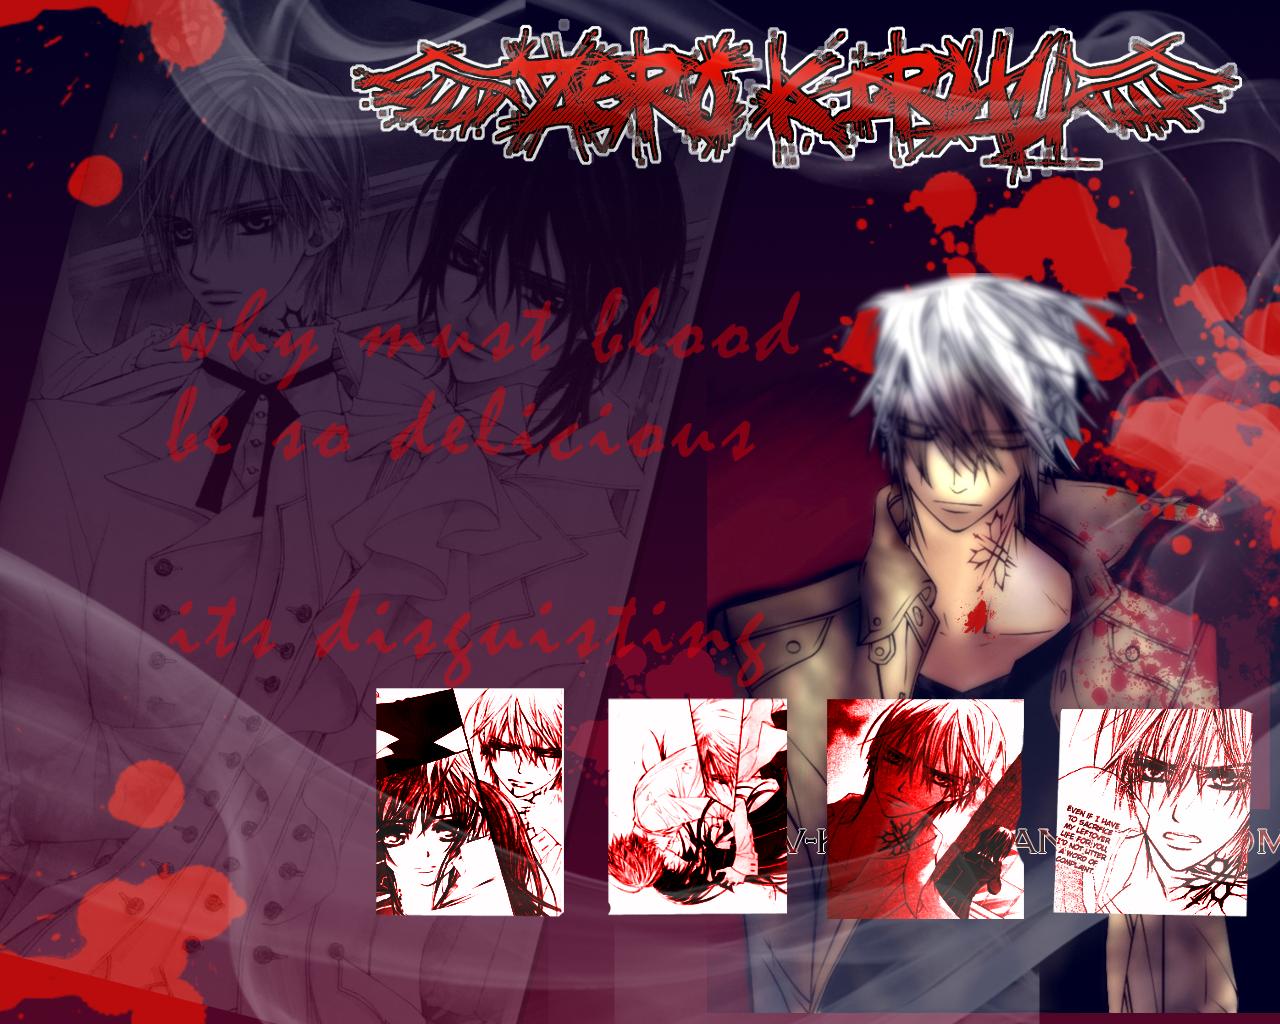 Zero Kiryu Wallpaper by iAnimelover12 on deviantART